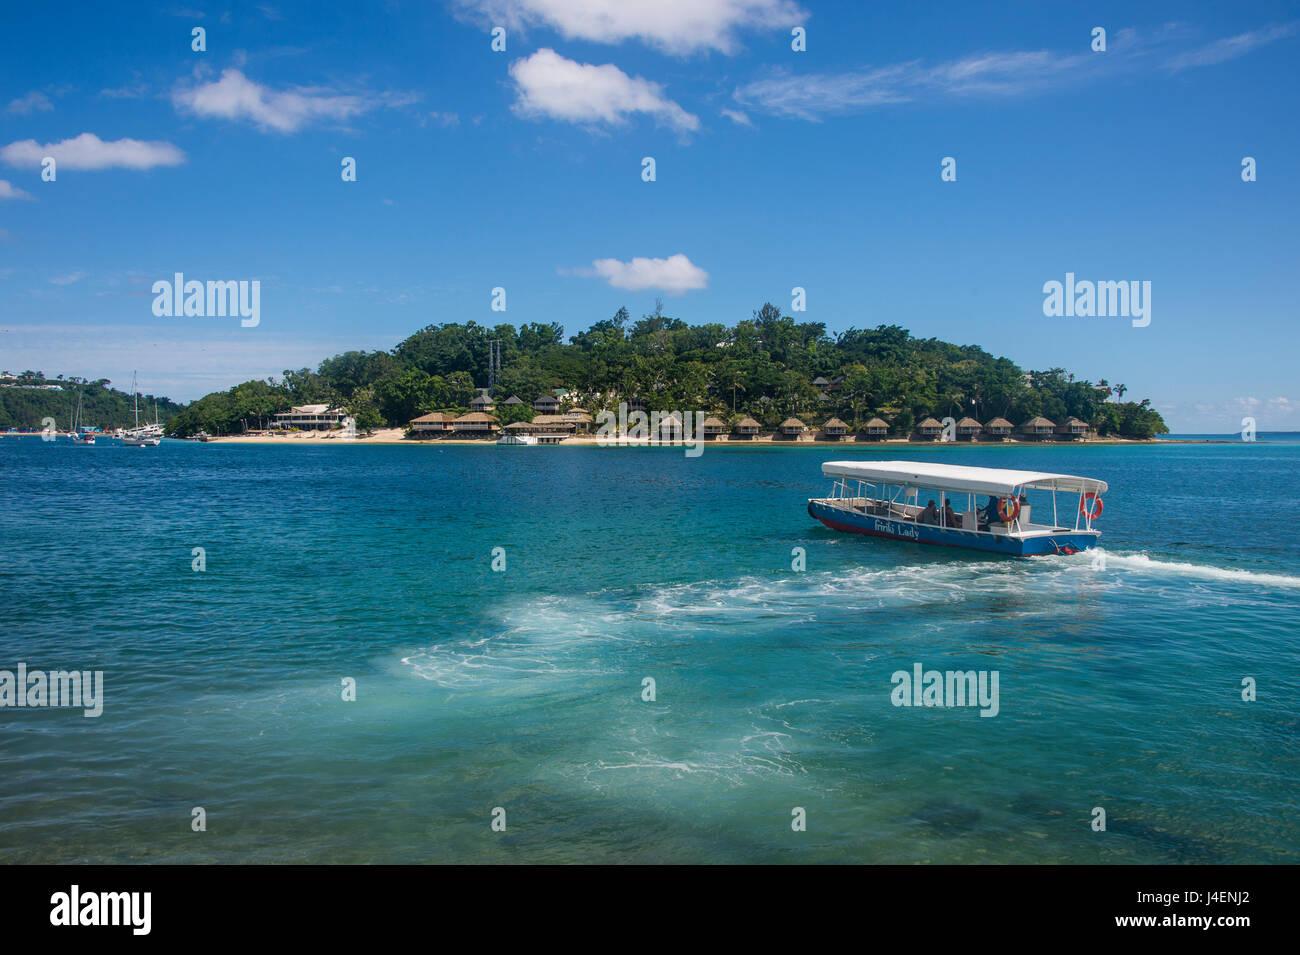 Transfer to the exclusive Iririki Island, Efate, Vanuatu, Pacific - Stock Image